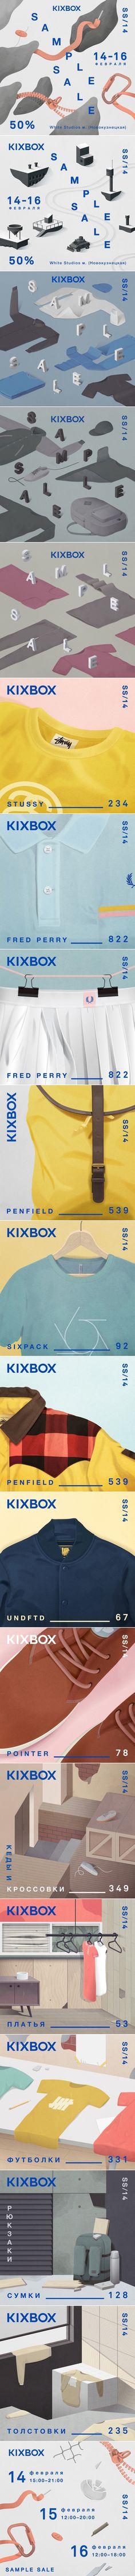 KixBox Sample Sale